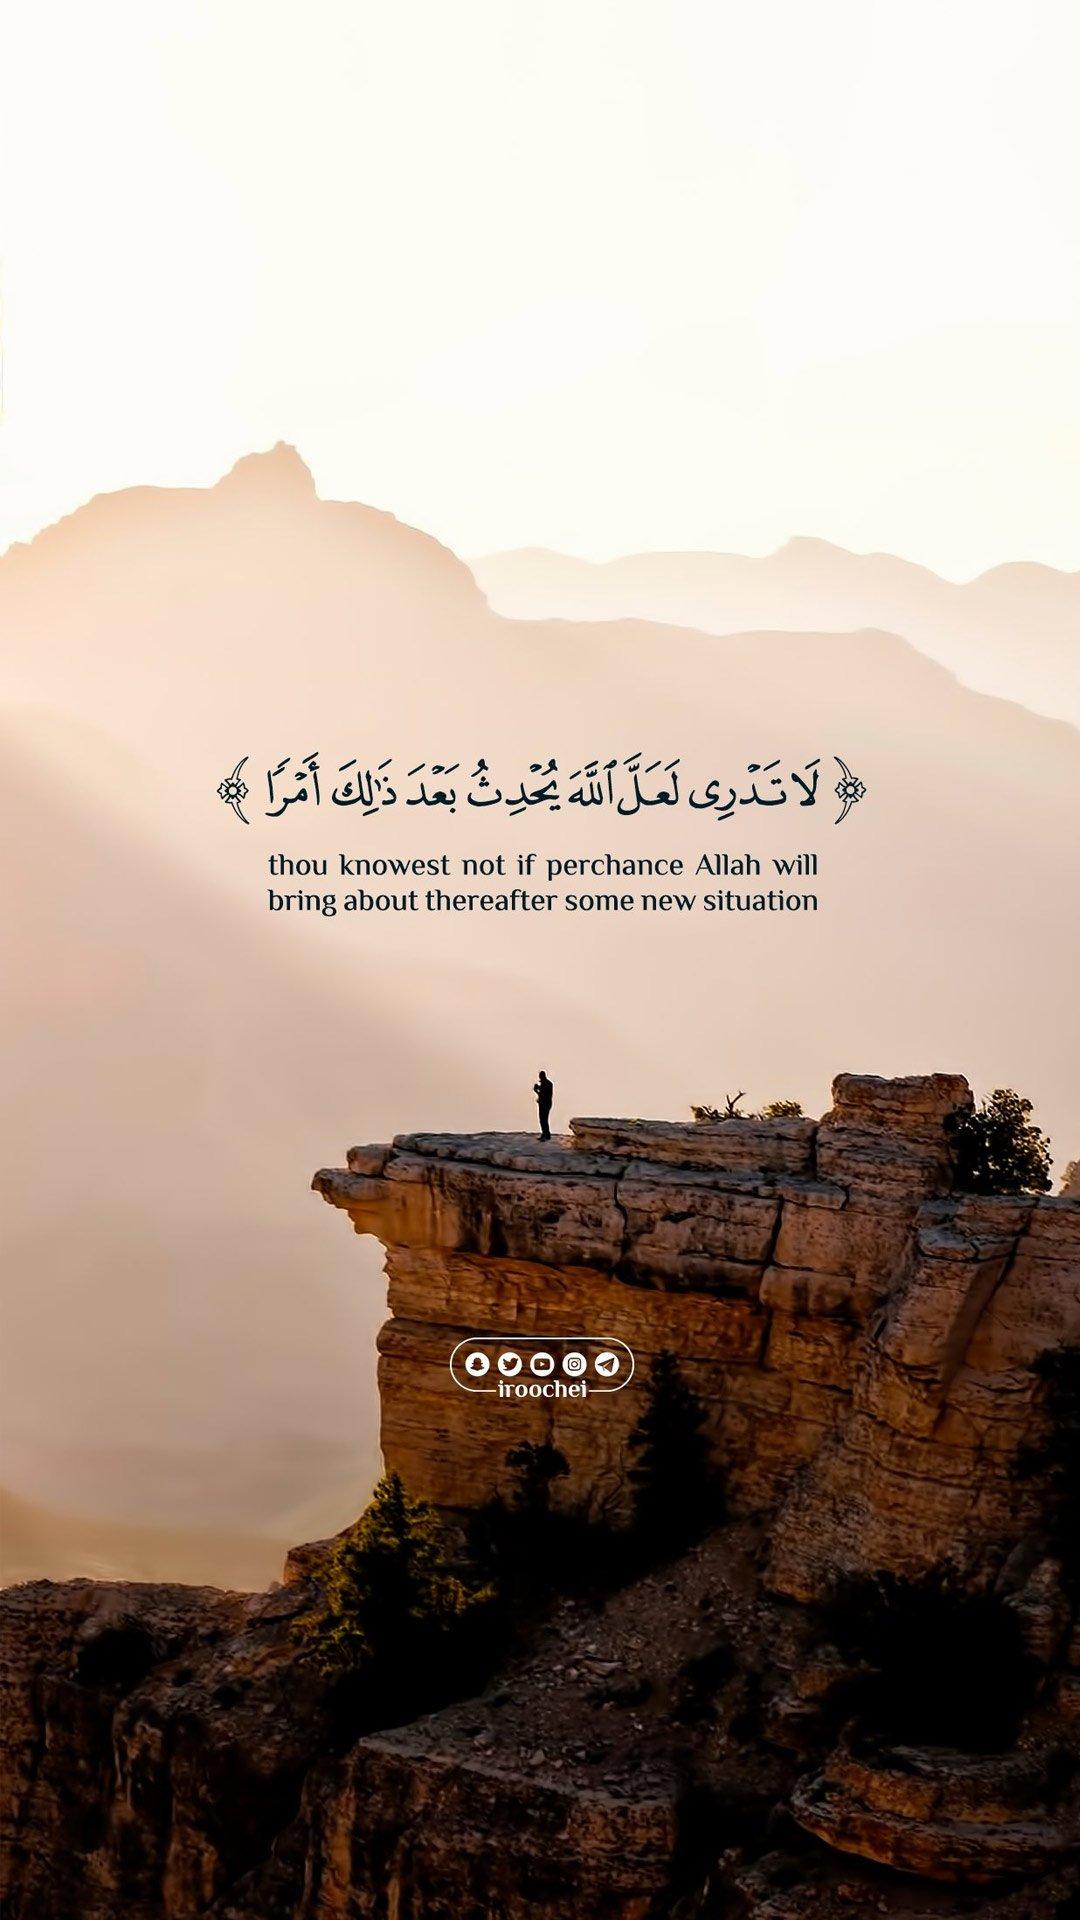 خلفيات ايفون اسلامية قران كريم مربع